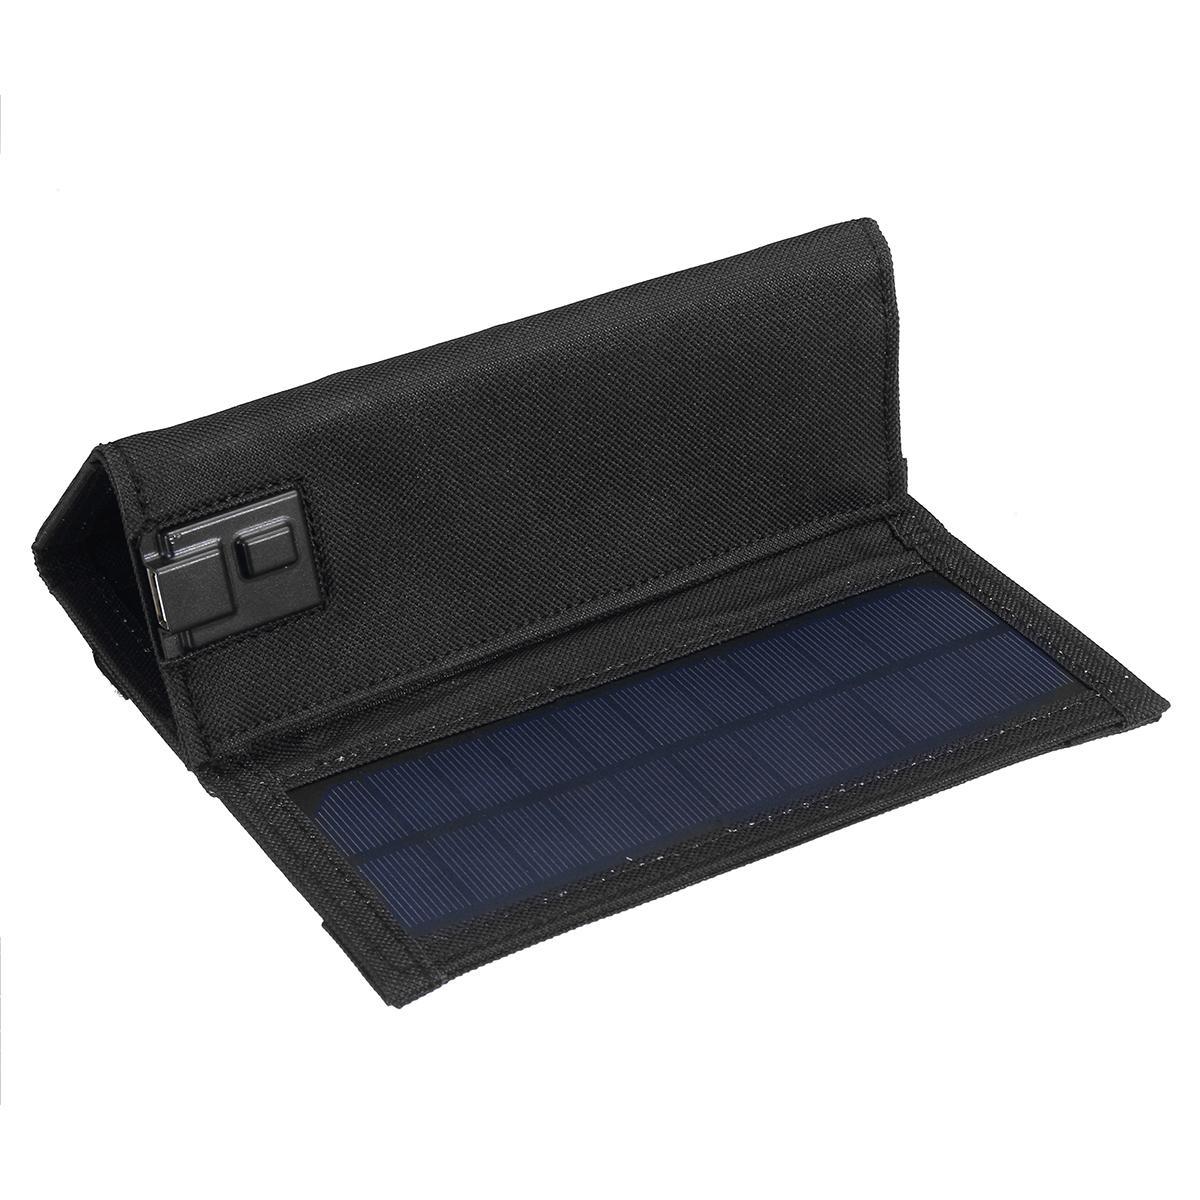 cabo usb carregador solar portátil para o telefone acampamento